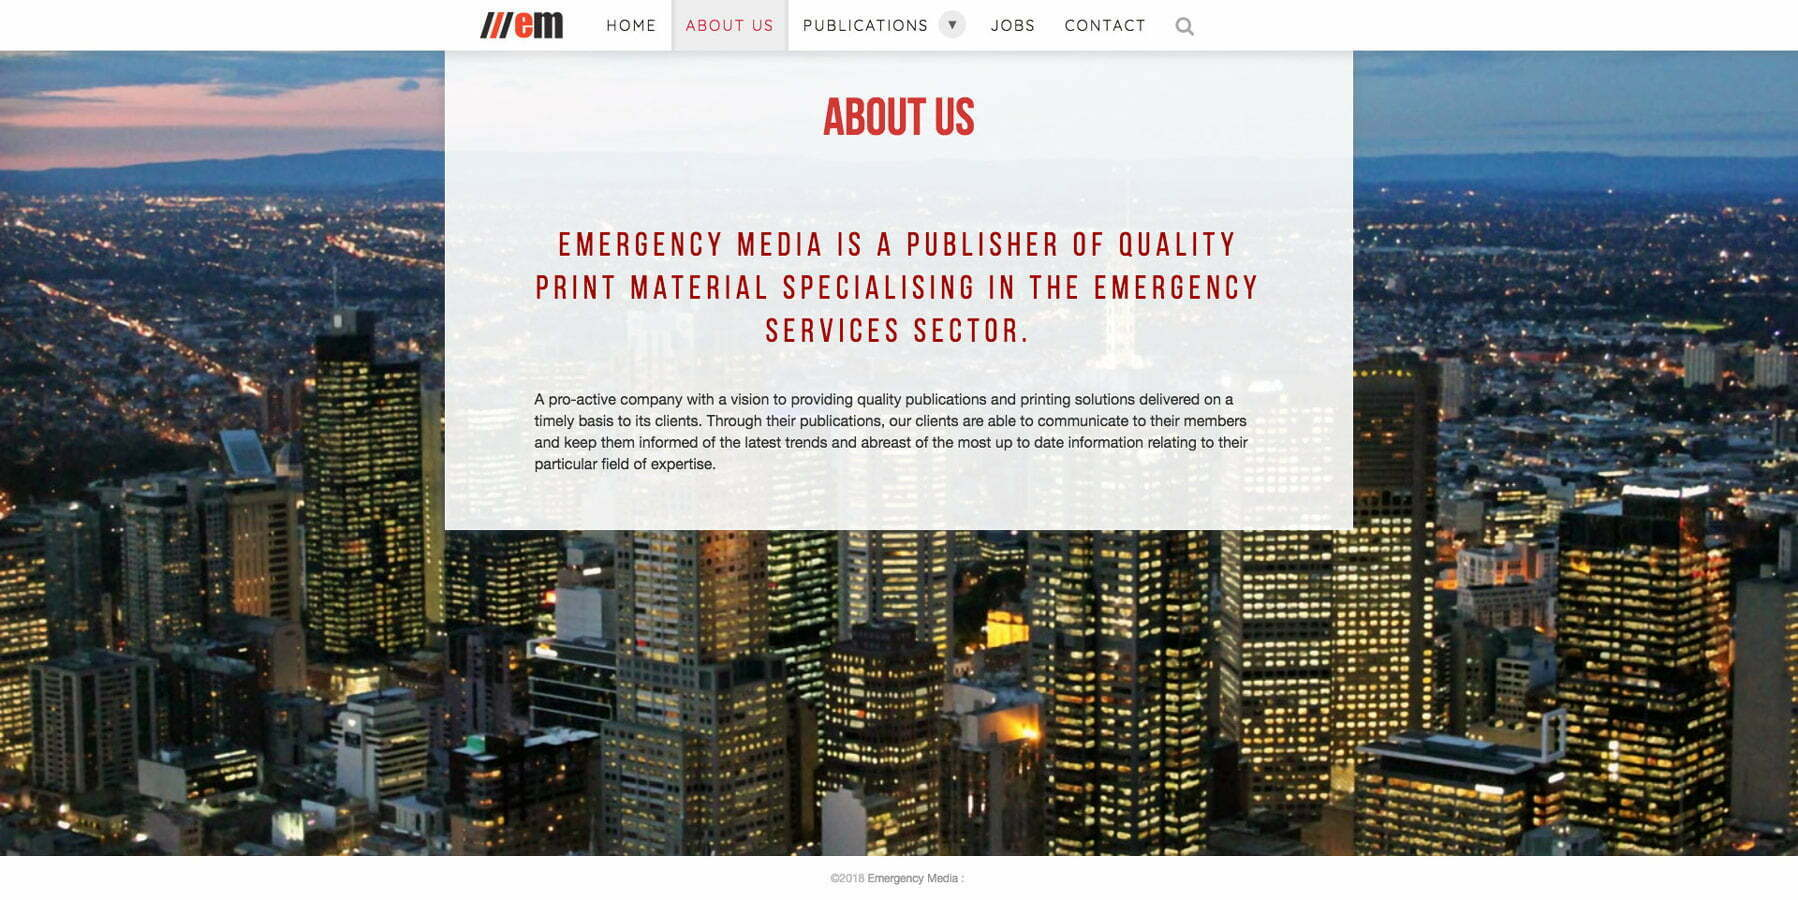 muzKore - Project - Emergency Media - About Us